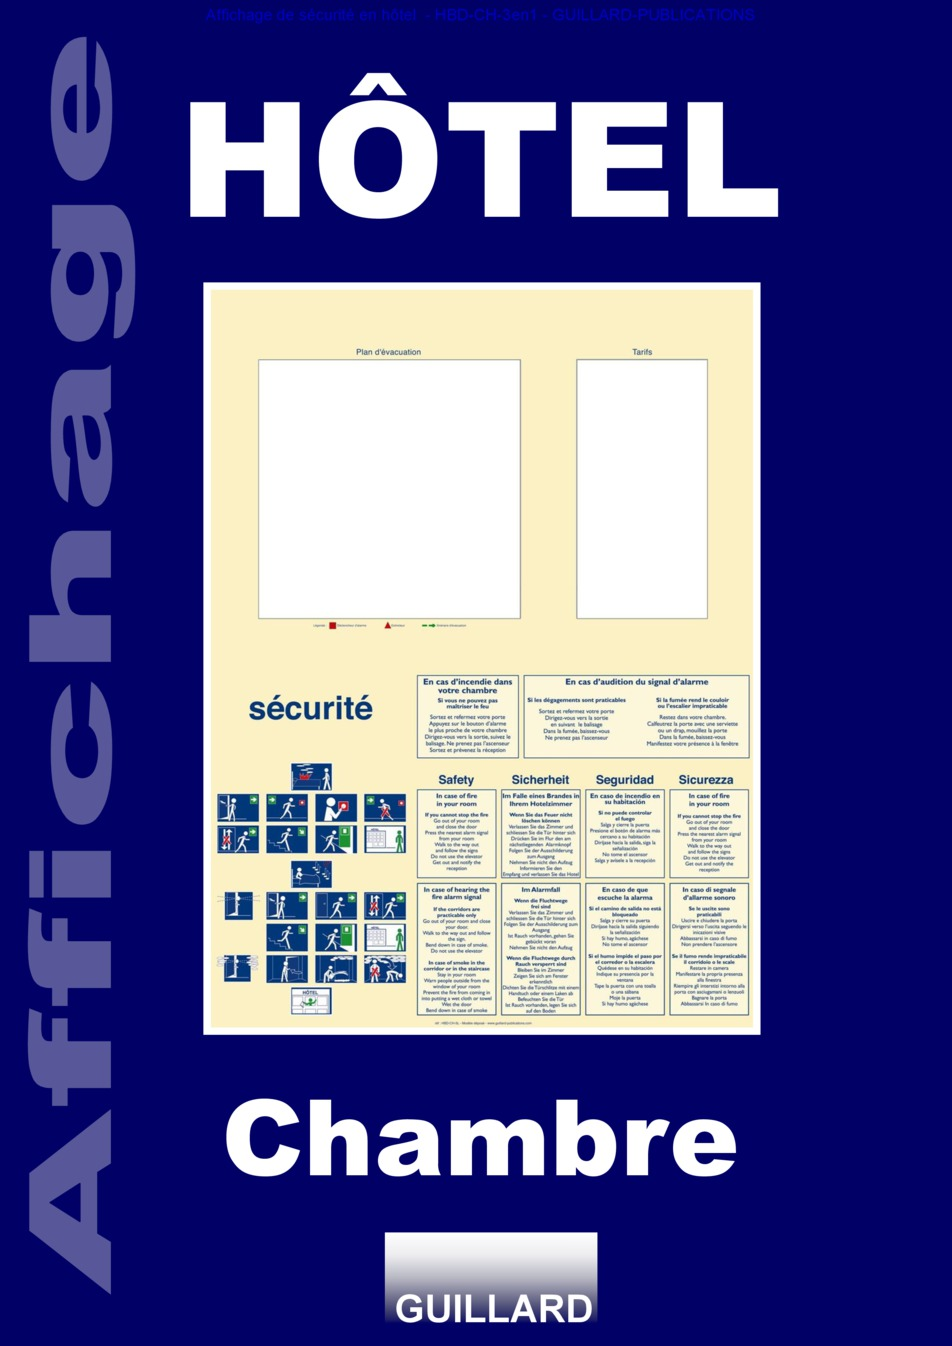 affichage de securite hotel chambre source www